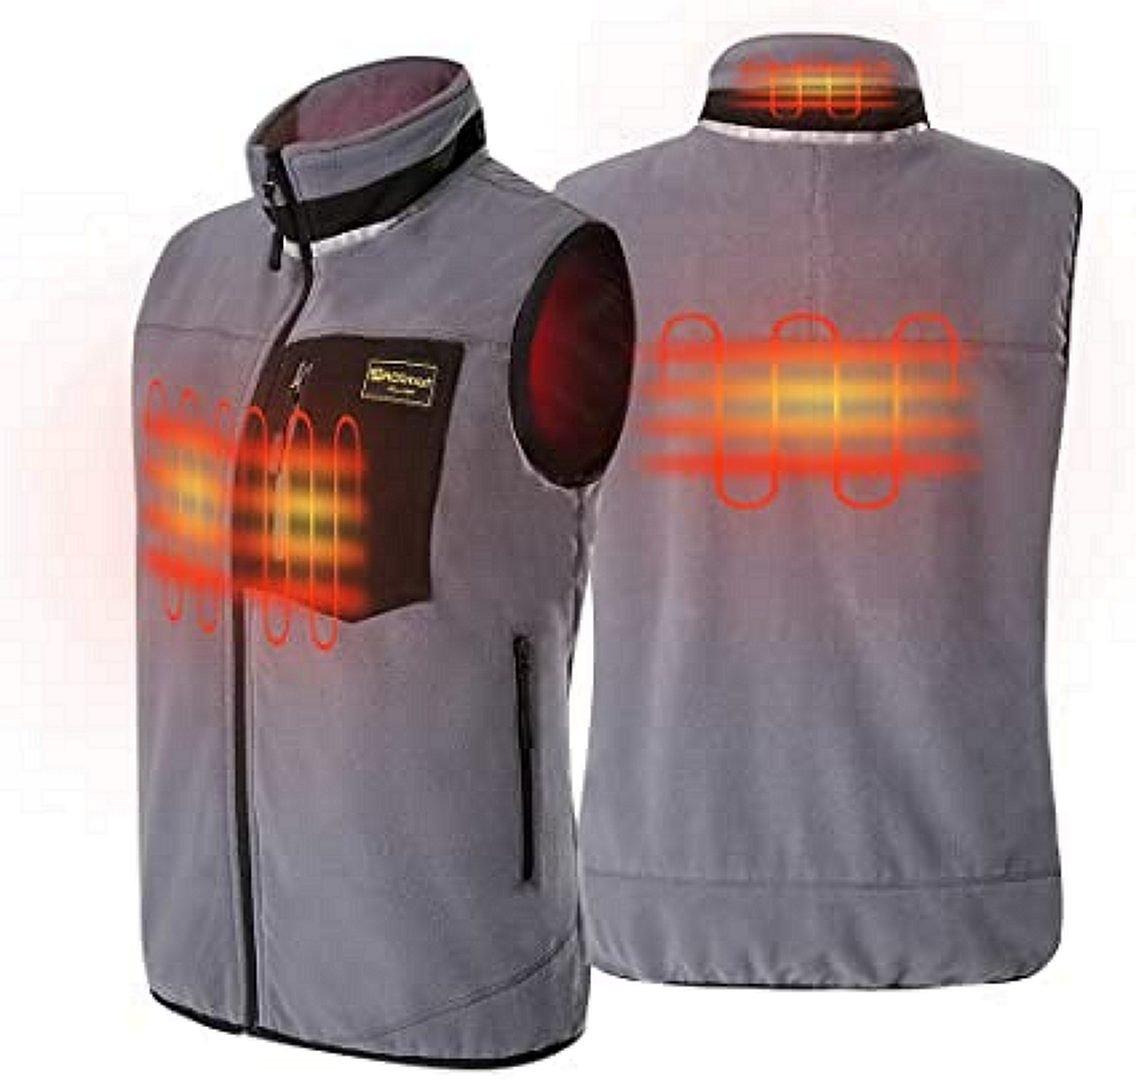 PROSmart Fleece Heated Vest